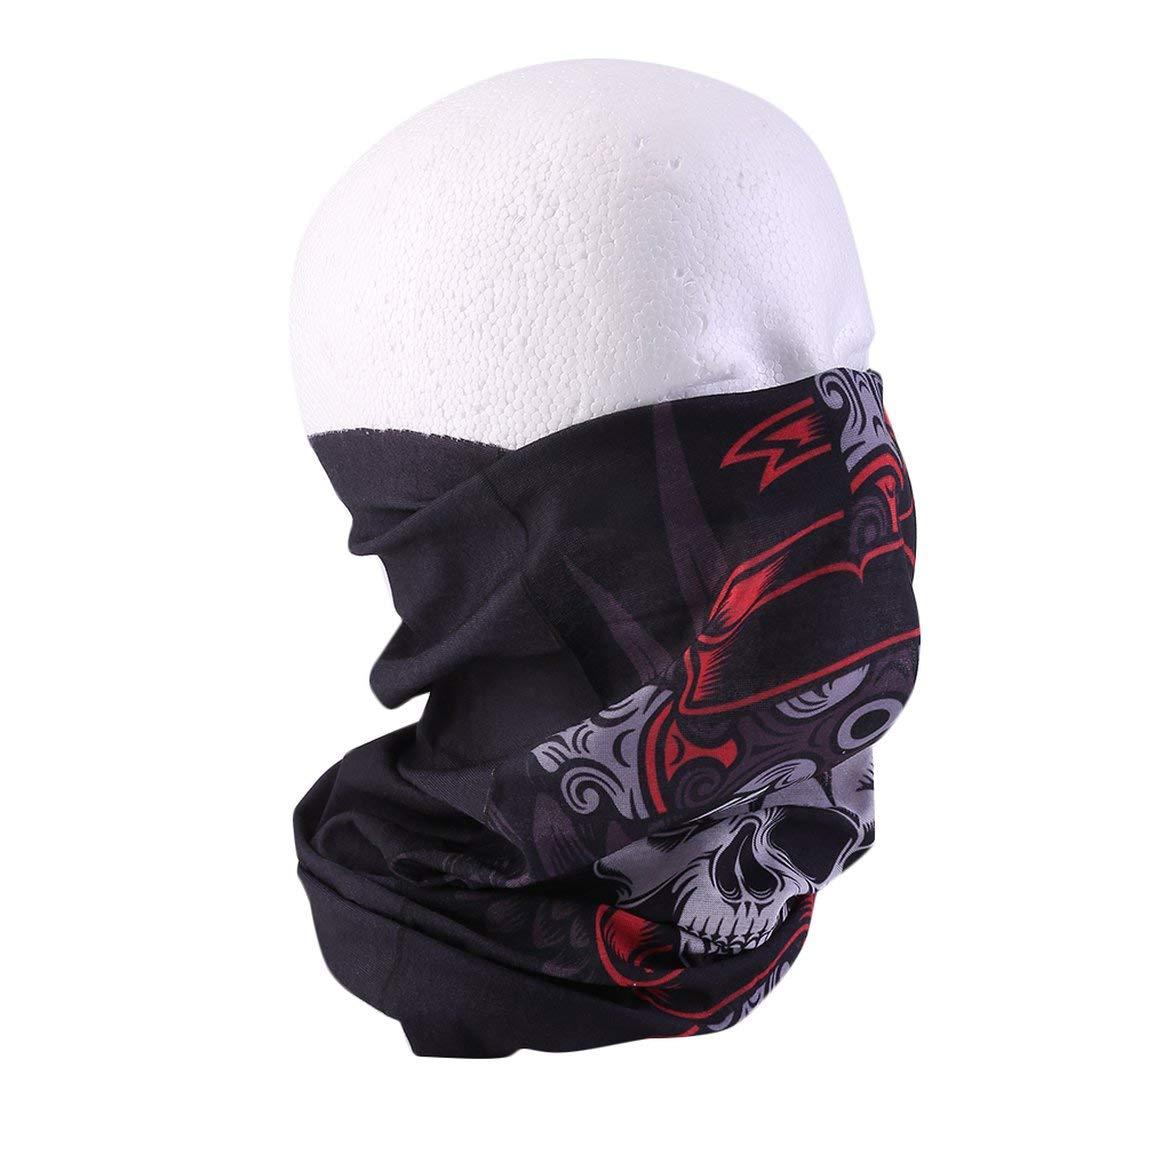 color:Skeleton faces Stylish Seamless Scarf Multifunctional Climb Magic Skull Winter Outside Face Mask Climb Magic Snowboard Unisex Scarves